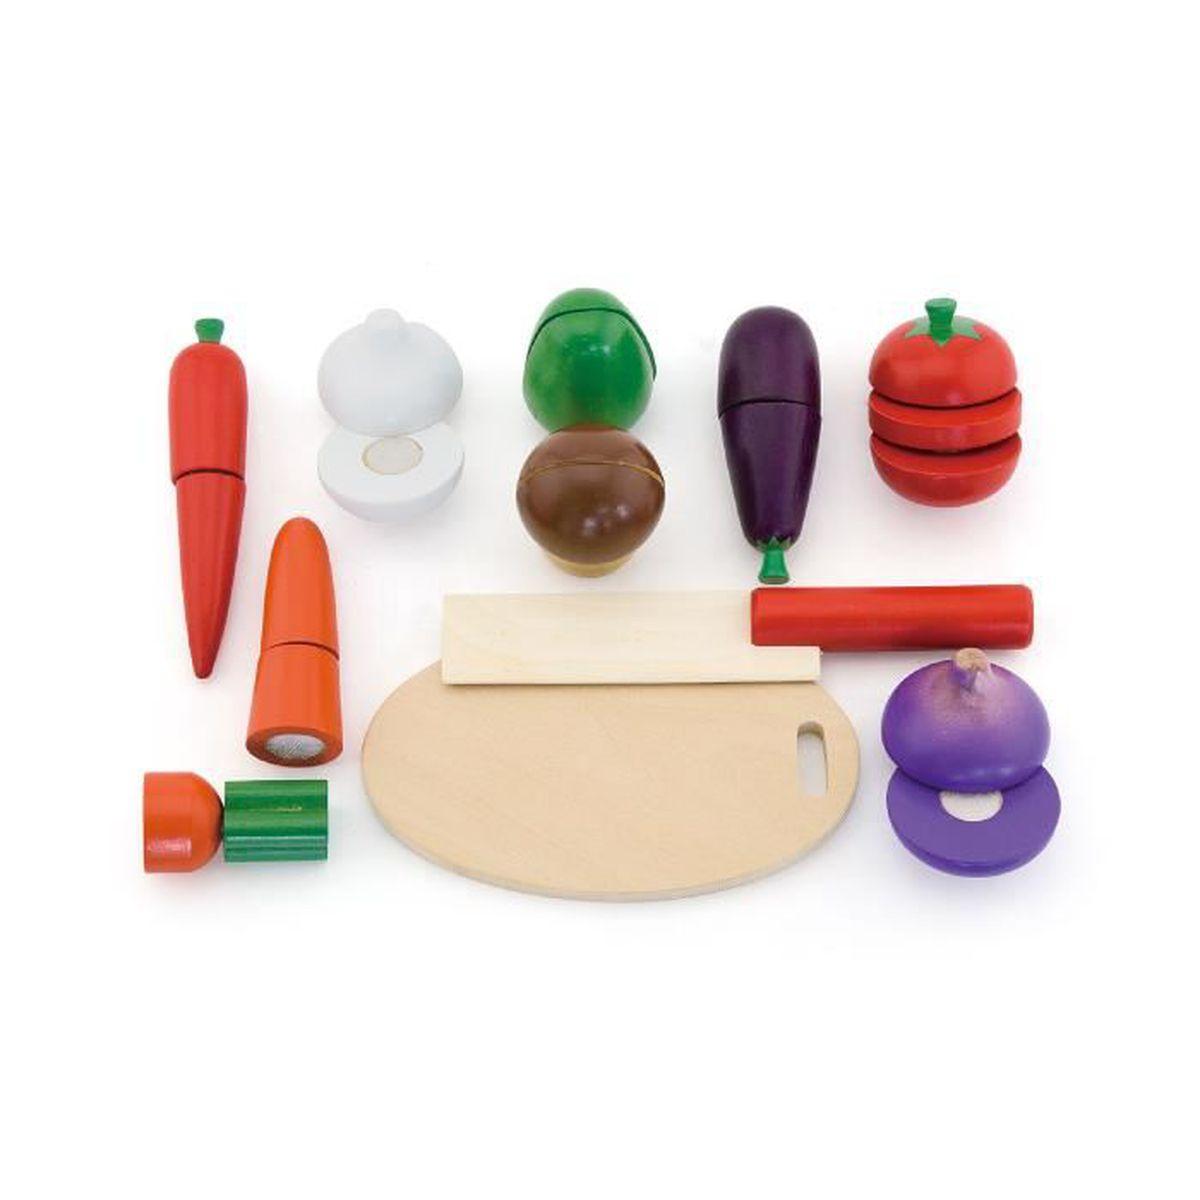 l gumes en bois jeu d couper b b enfant 18m. Black Bedroom Furniture Sets. Home Design Ideas